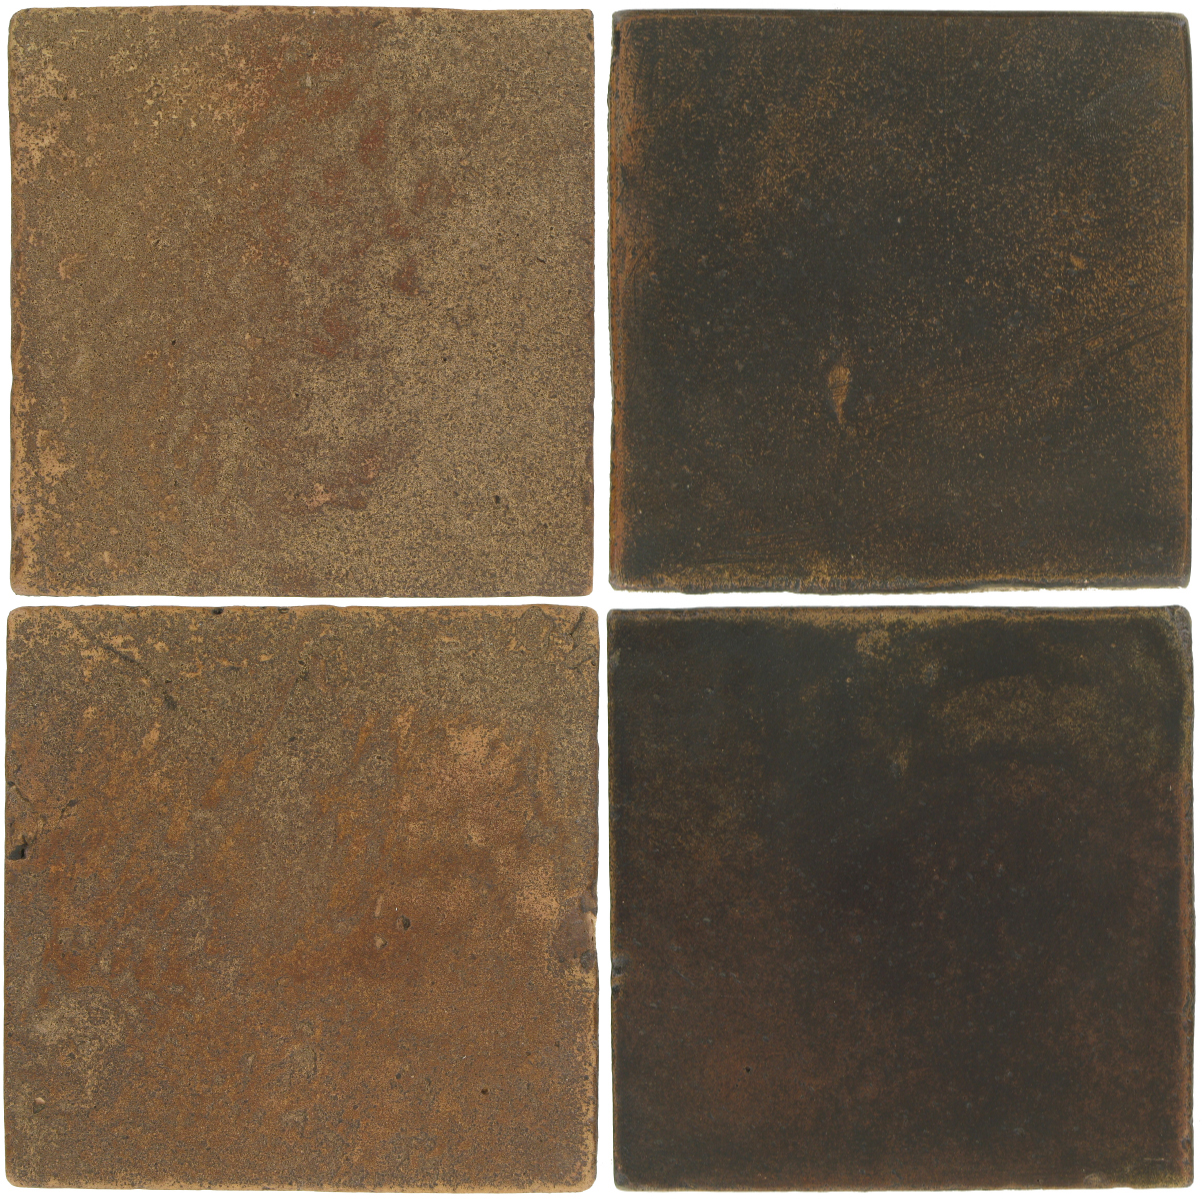 Pedralbes Antique Terracotta  2 Color Combinations  VTG-PSCM Camel Brown + OHS-PSCO Cologne Brown